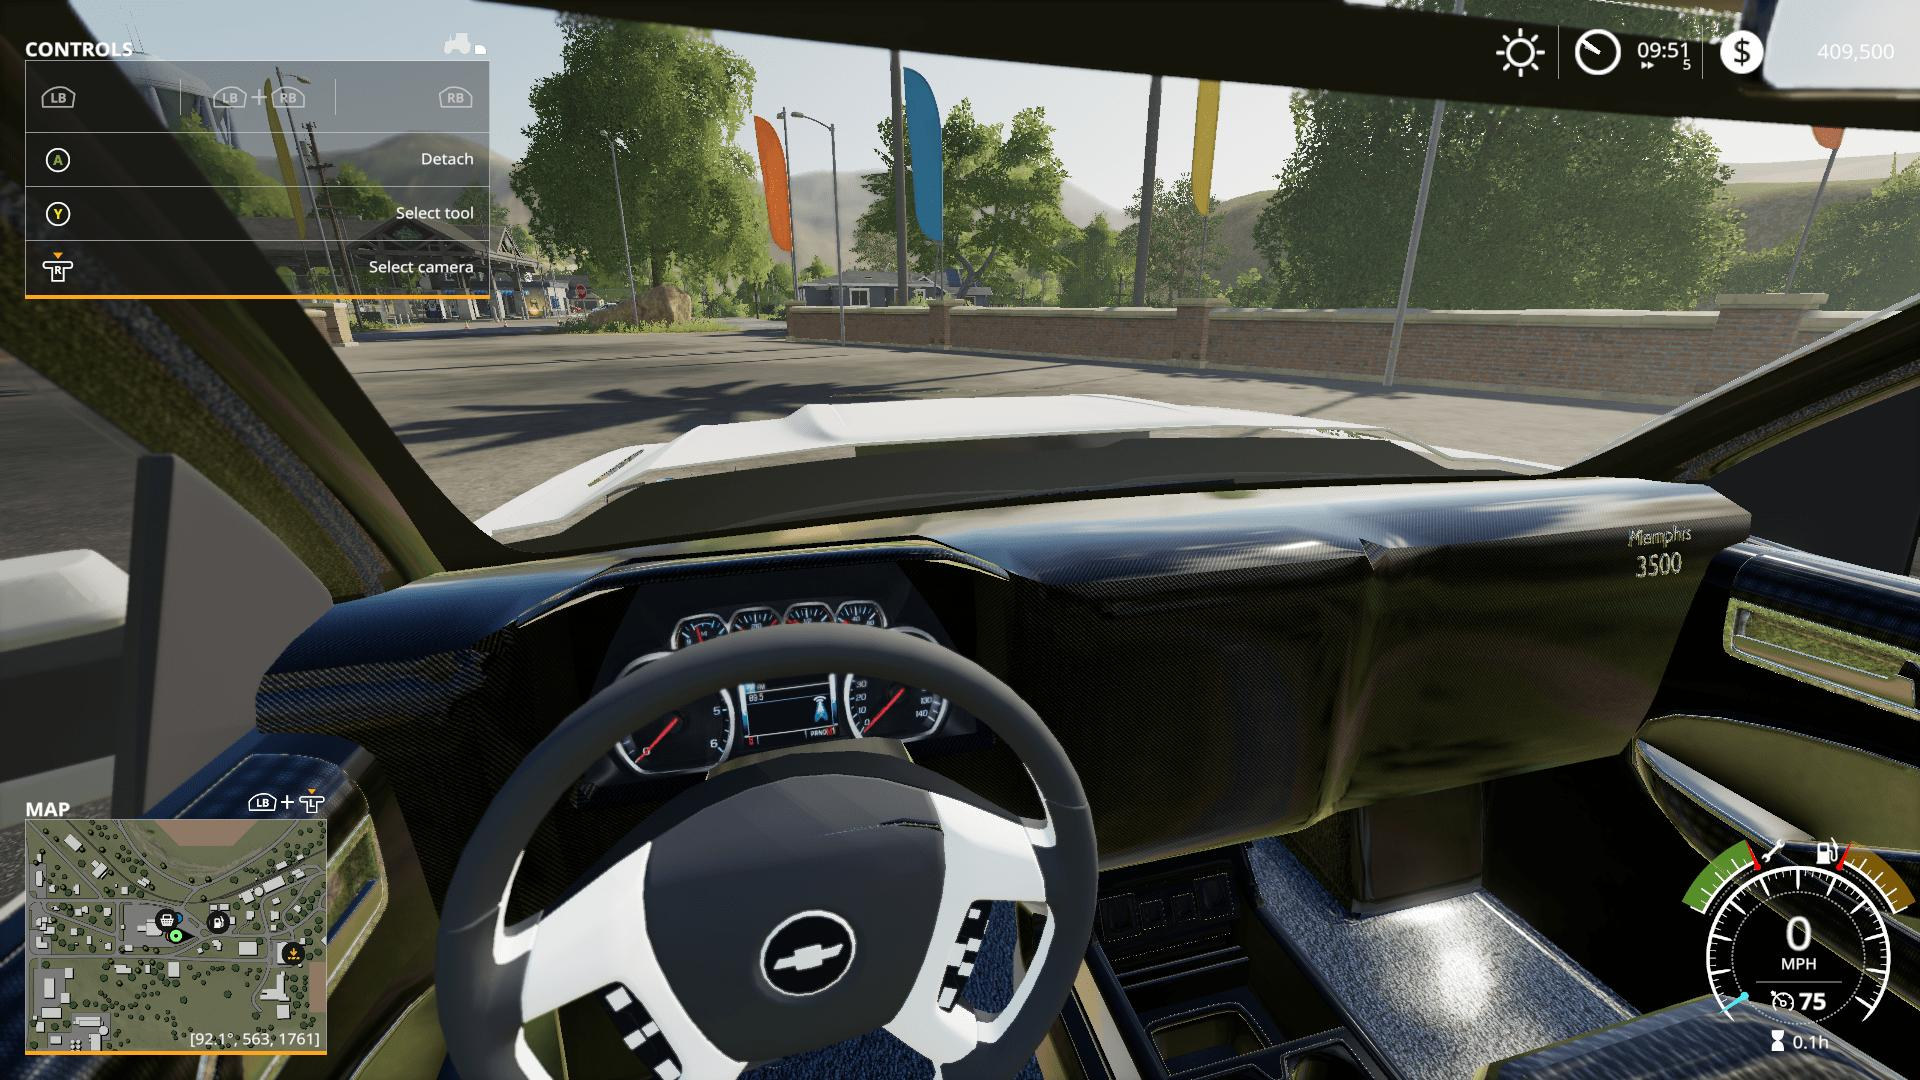 Chevy 3500 Duramax Mod v 1.0